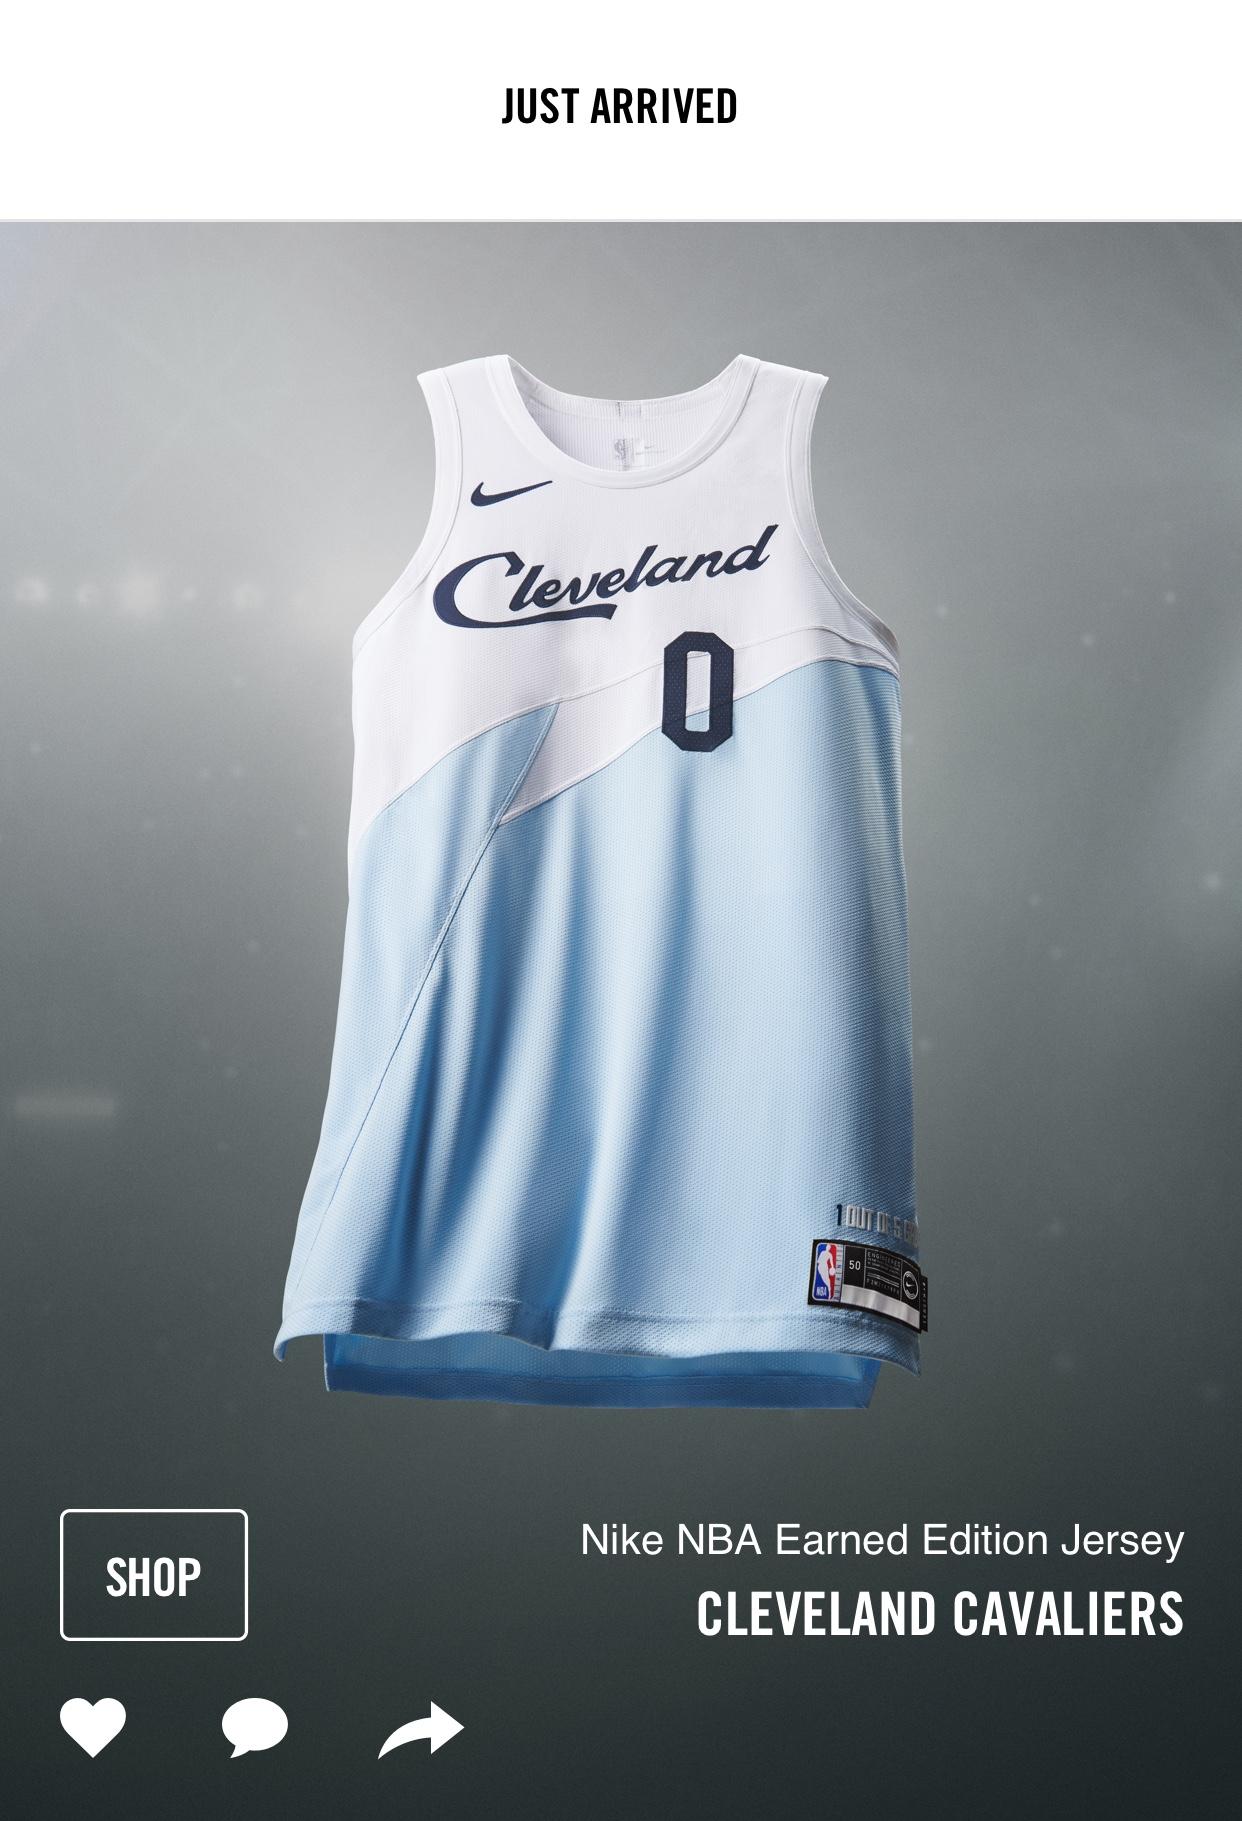 Nike_NBA_EE_Cleveland_Cavaliers_APP_FeedCard_NoCTA.jpg